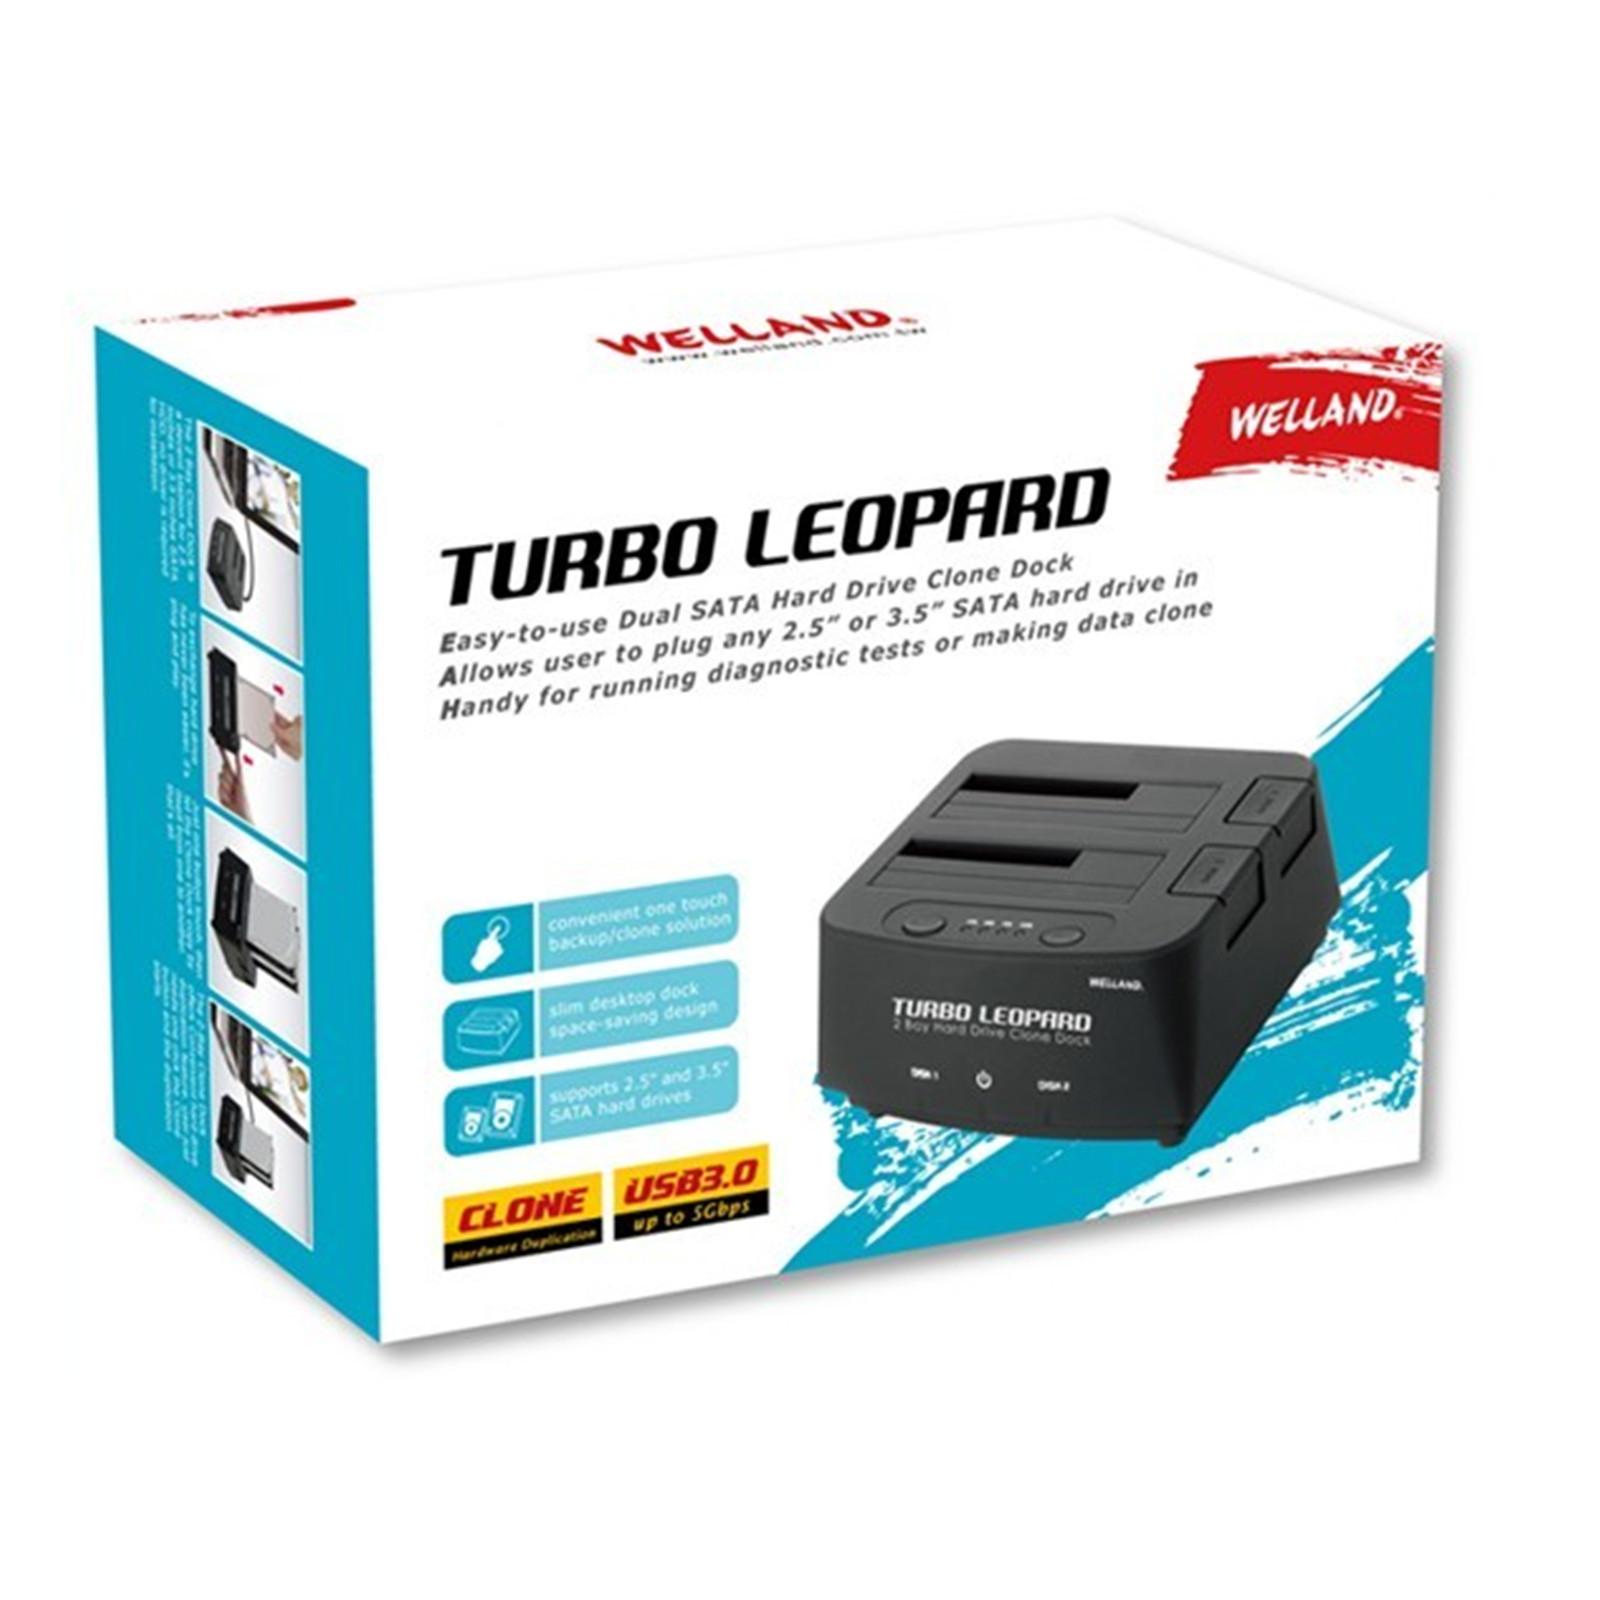 Buy The Welland Turbo Leopard Me 603e 25 35 Sata To Usb 30 Orico 6629us3 C Dual Bay External Hdd Docking Station Enclosure Black